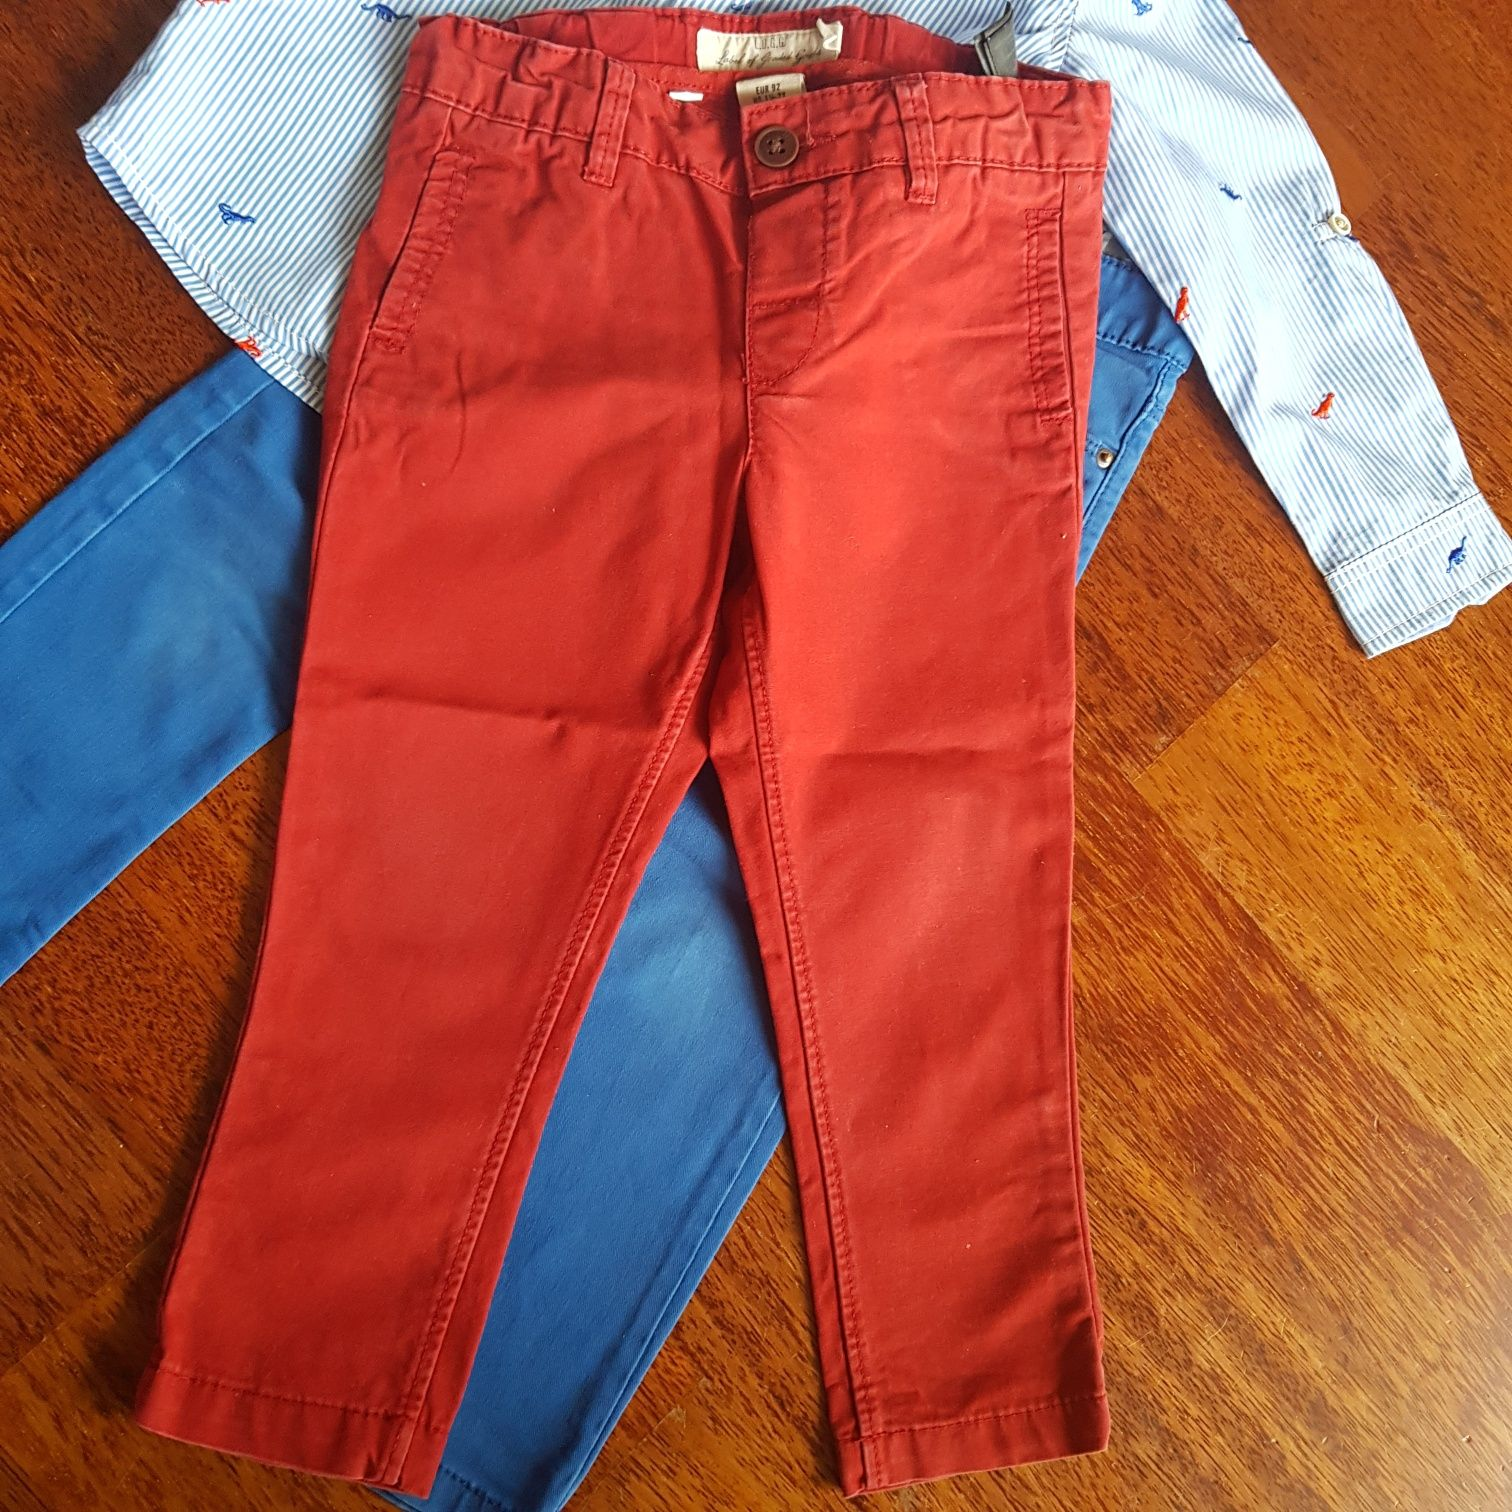 Spodnie H&M rozm. 98